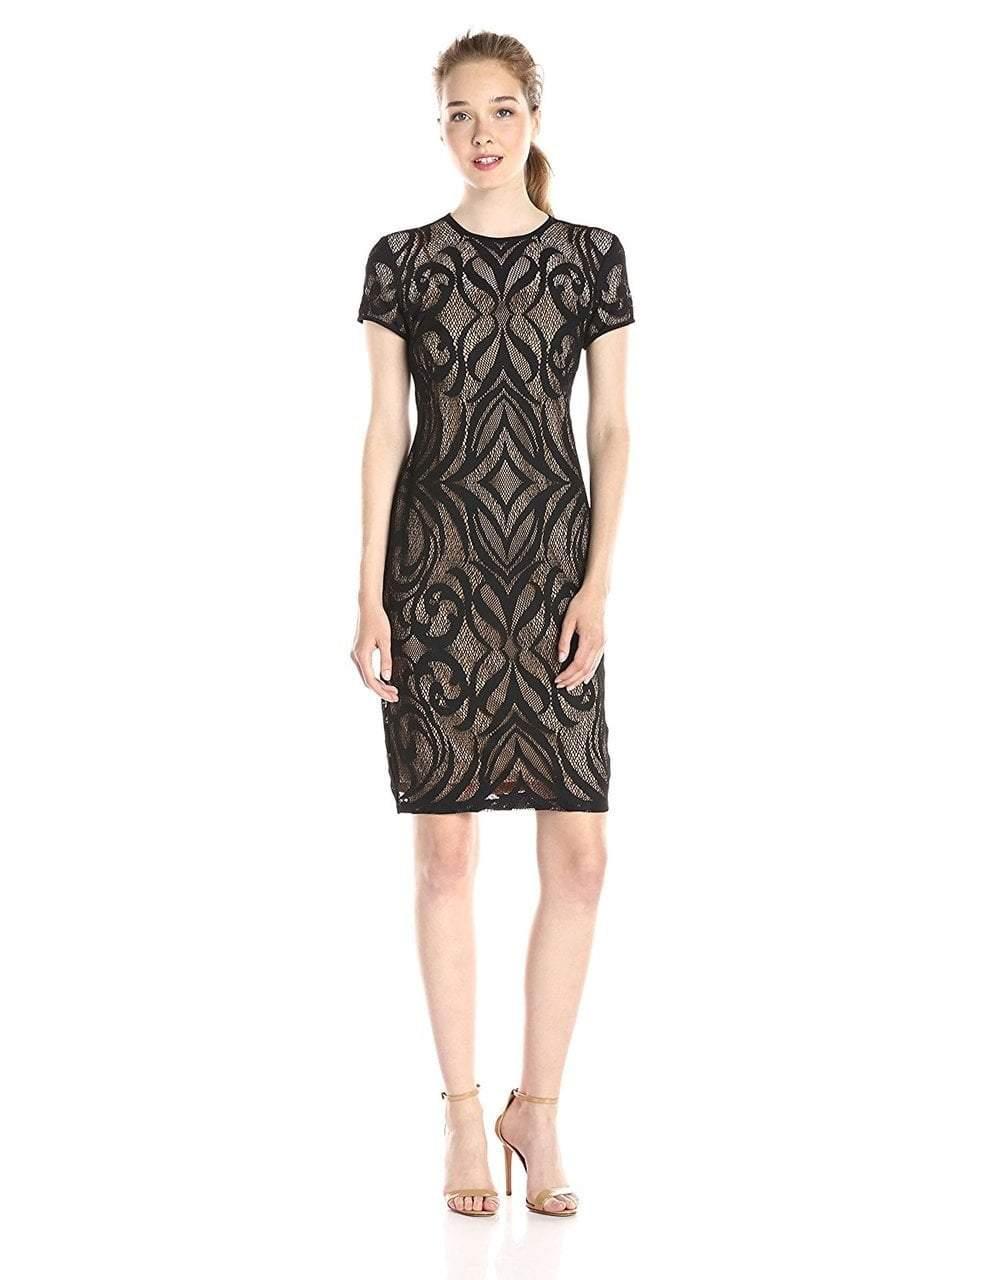 Taylor - Lace Jewel Neck Pencil Cut Dress 5677M